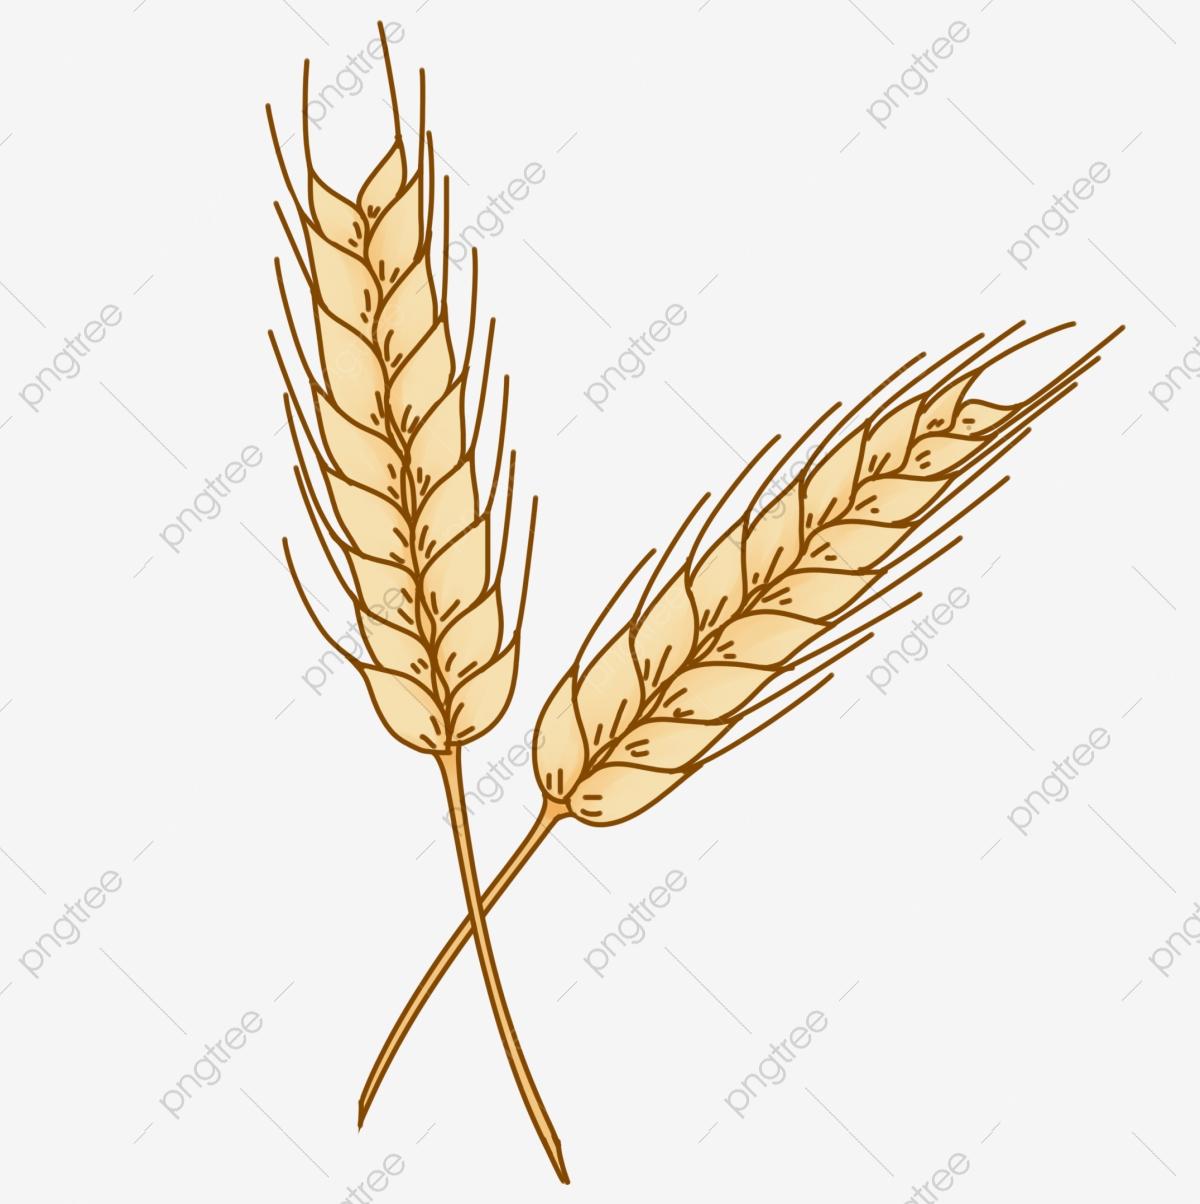 Wheat clipart barley. Hand painted ears health